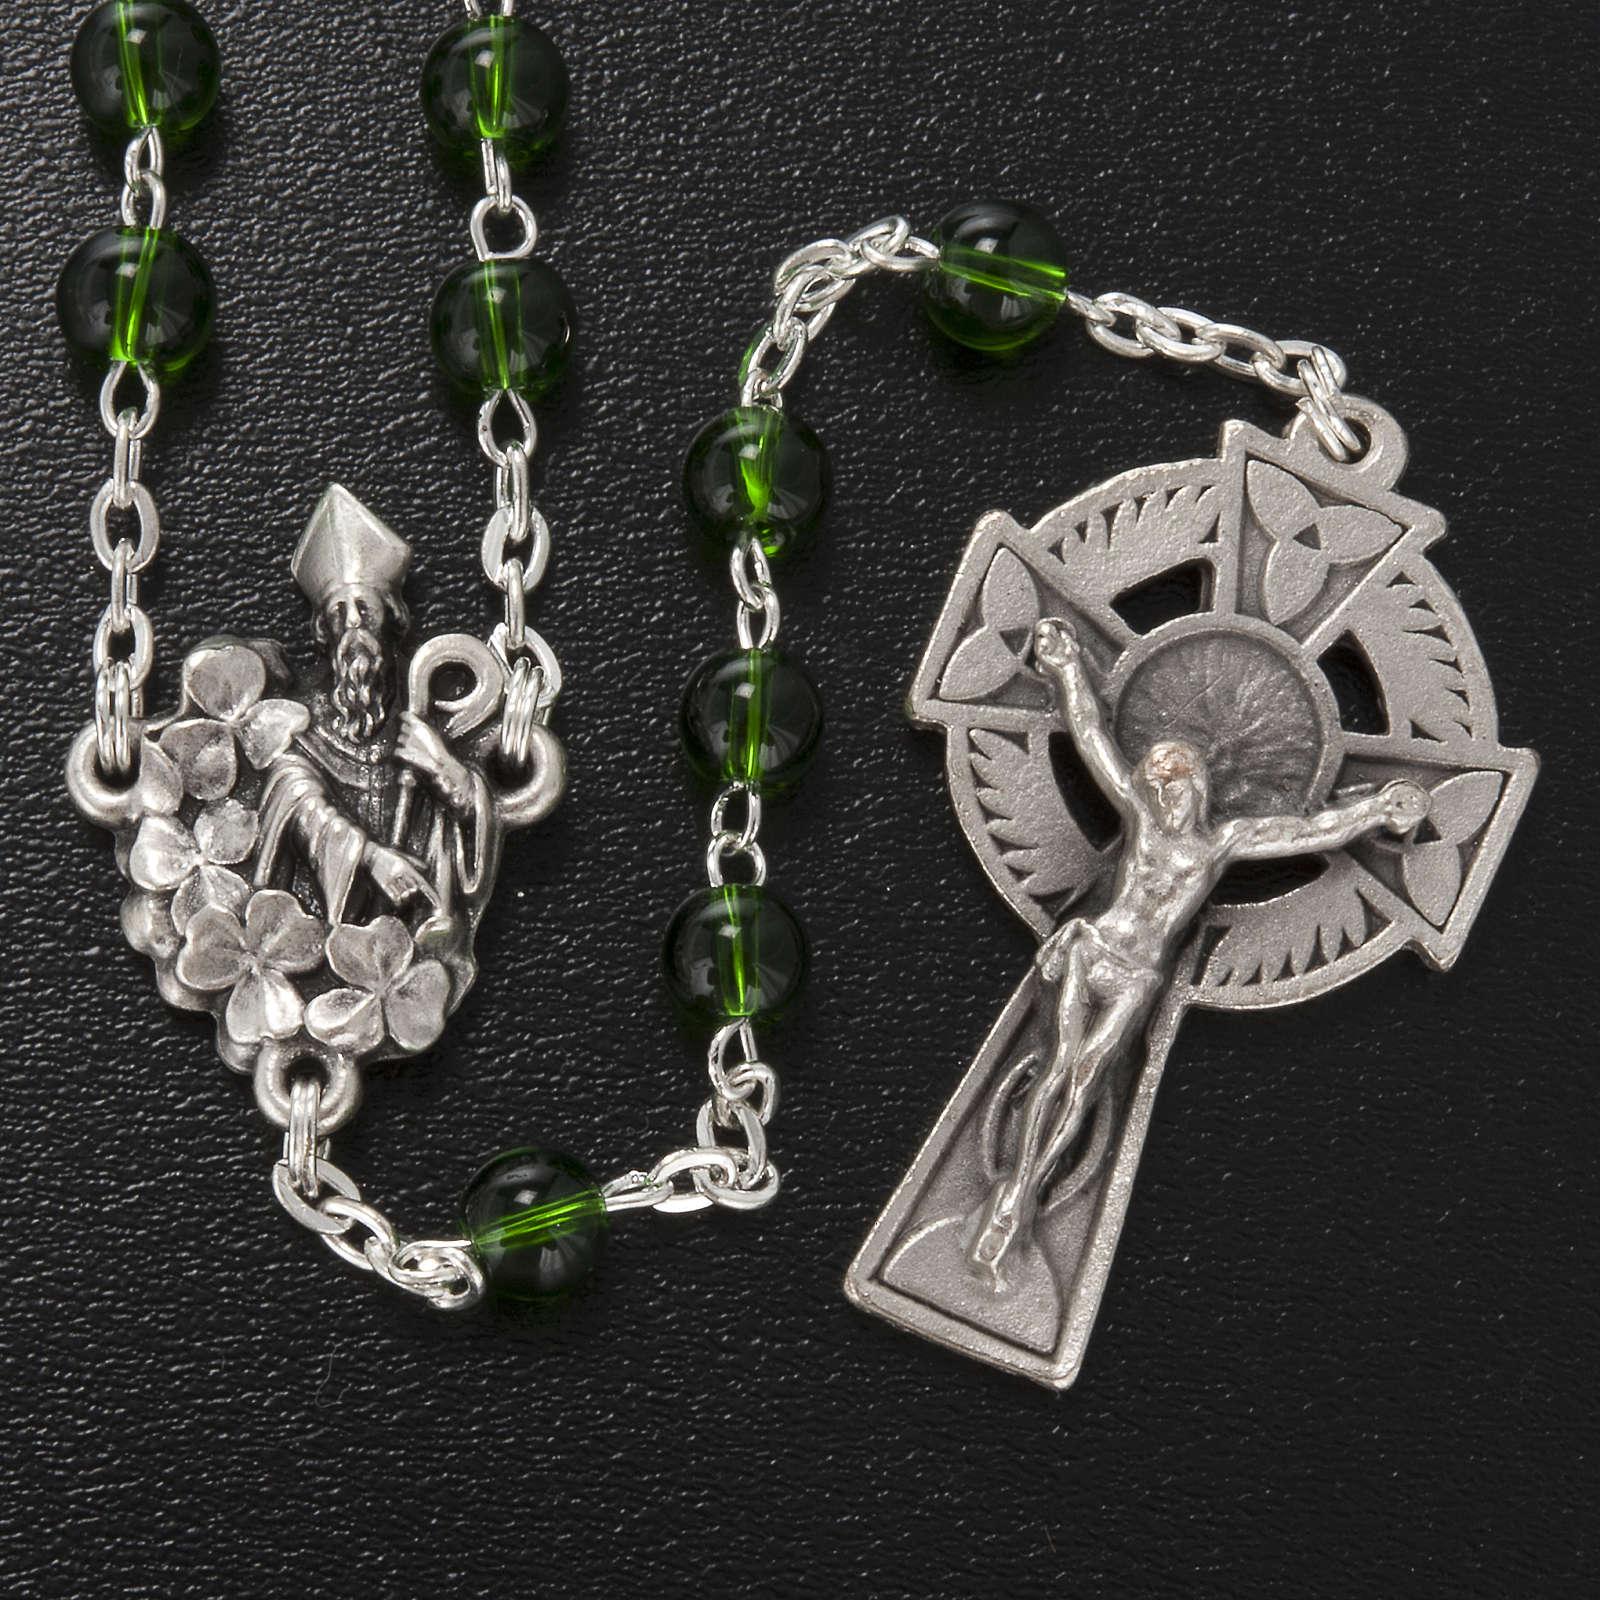 Chapelet Ghirelli St. Patrick verre vert 6mm 4